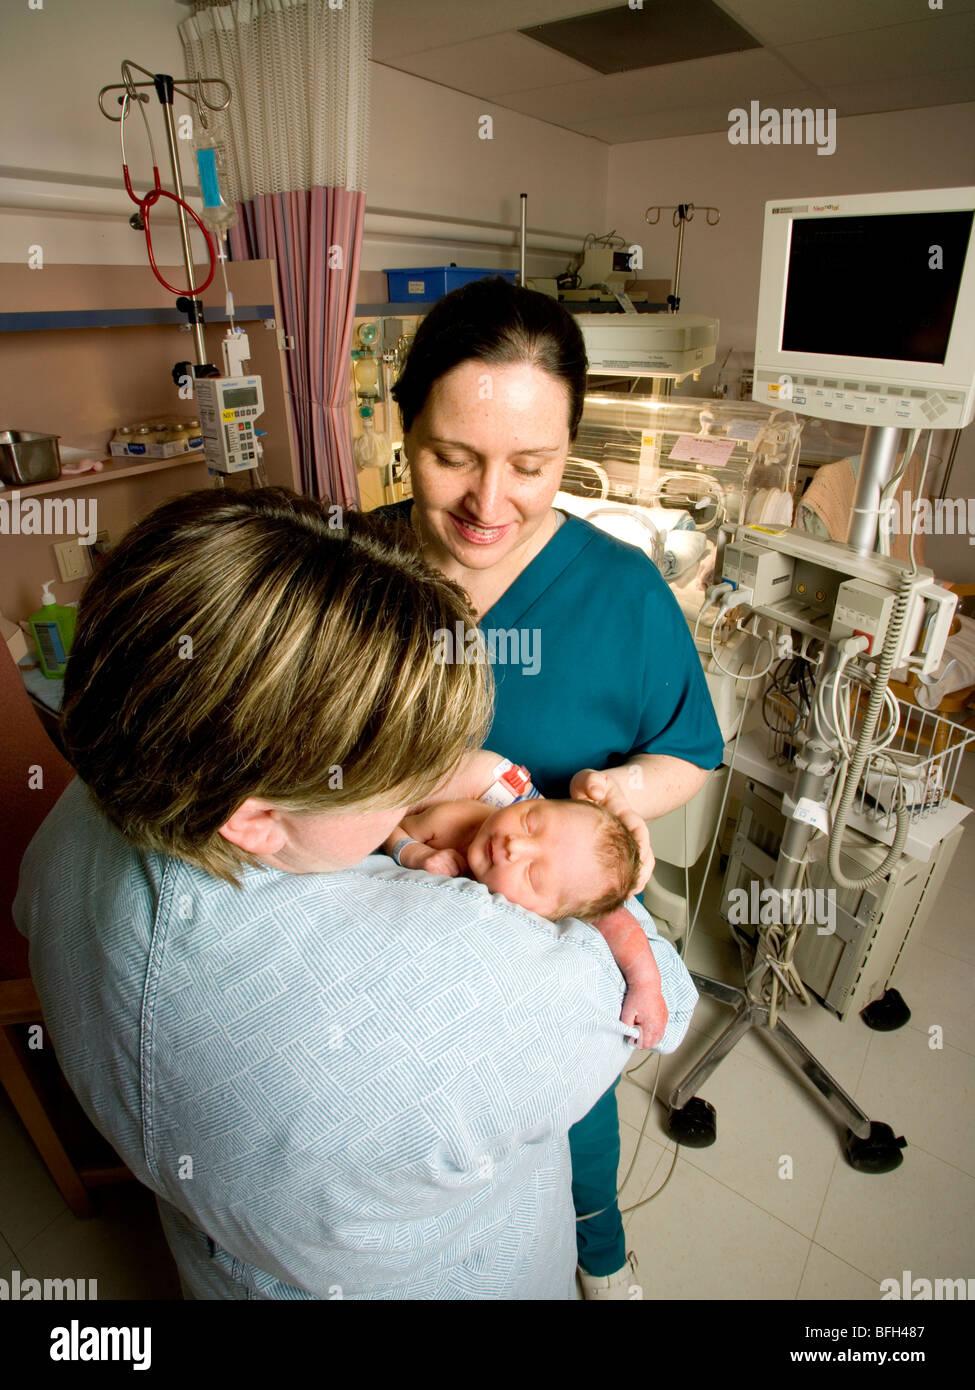 Queen Elizabeth Hospital, Charlottetown Prince Edward Island - Stock Image